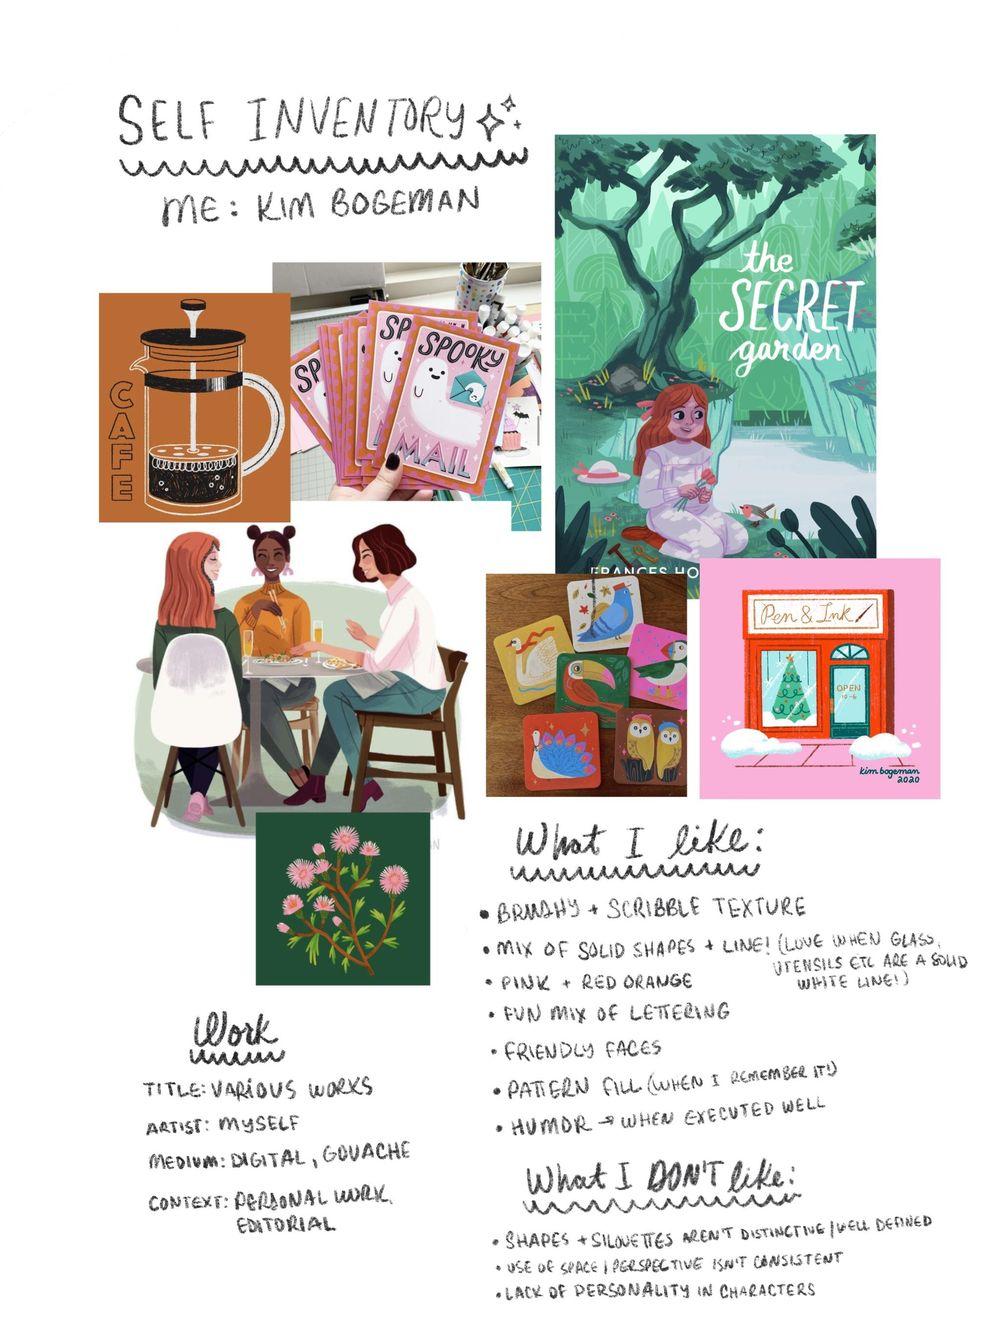 Kim Bogeman - Afternoon Tea - image 4 - student project